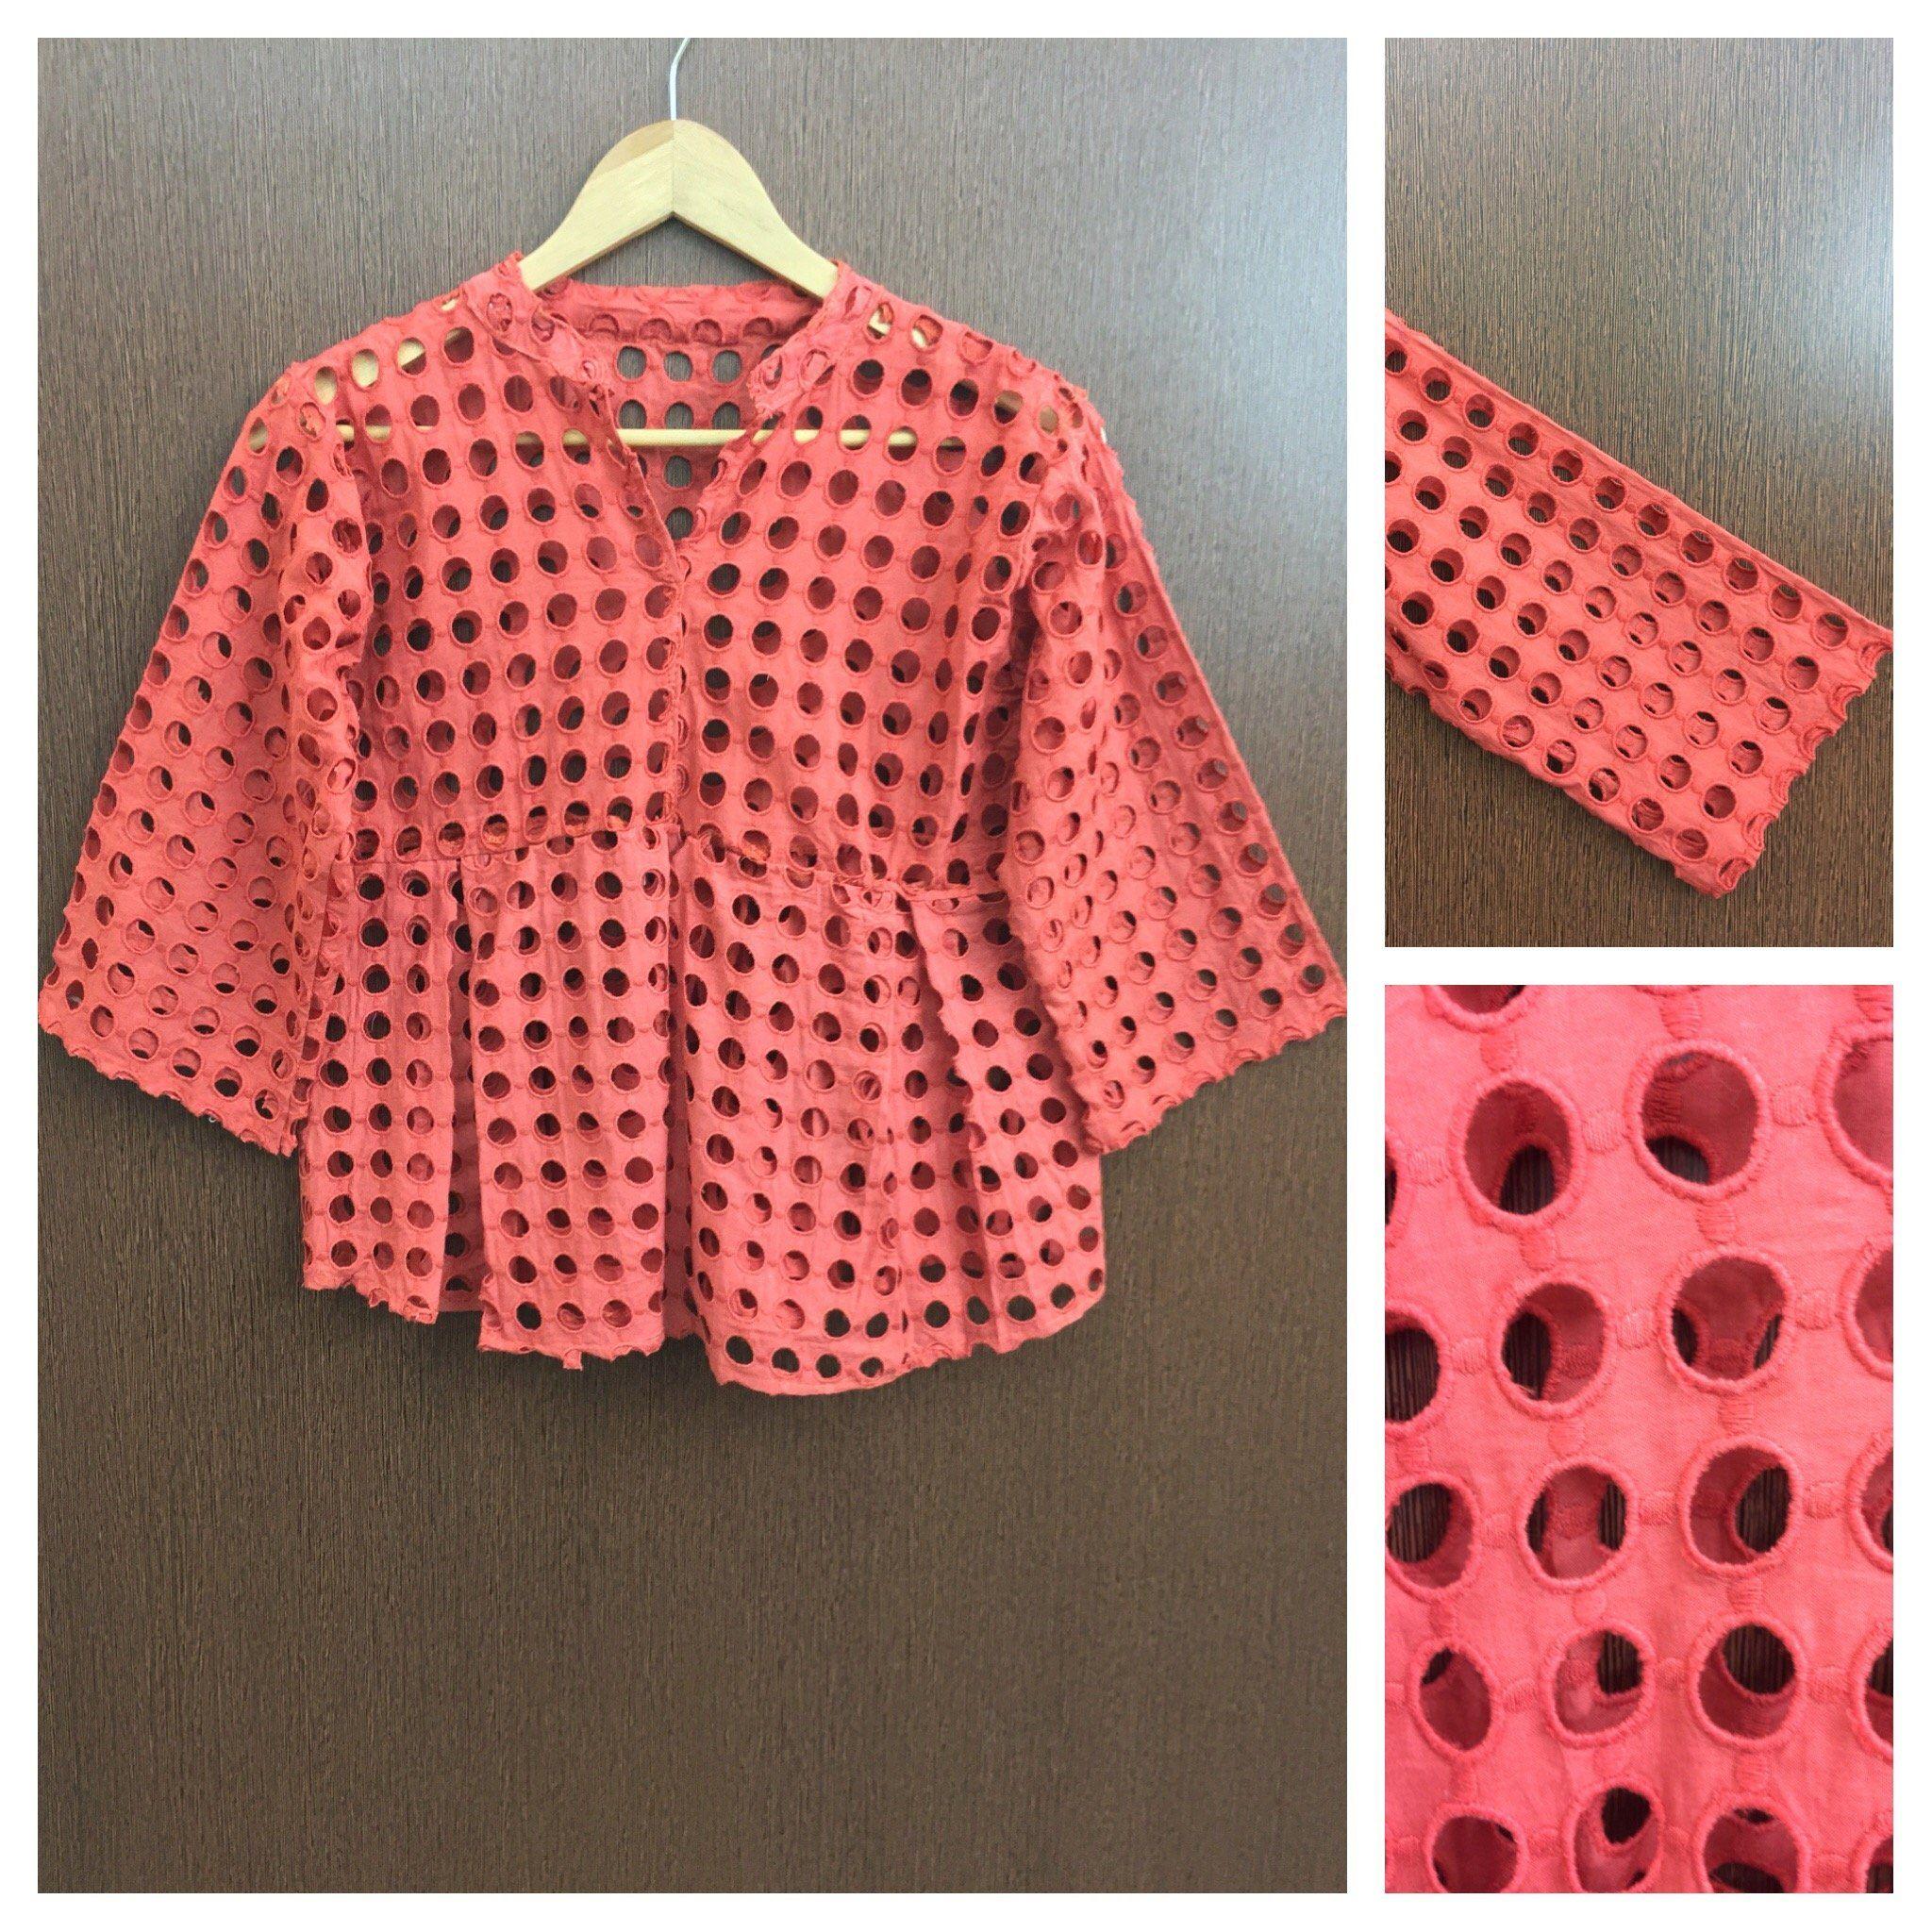 Buy yours today: Ruffled - Circula..., visit http://ftfy.bargains/products/ruffled-circular-cut-work-deep-orange-top?utm_campaign=social_autopilot&utm_source=pin&utm_medium=pin  #amazing #affordable #fashion #stylish